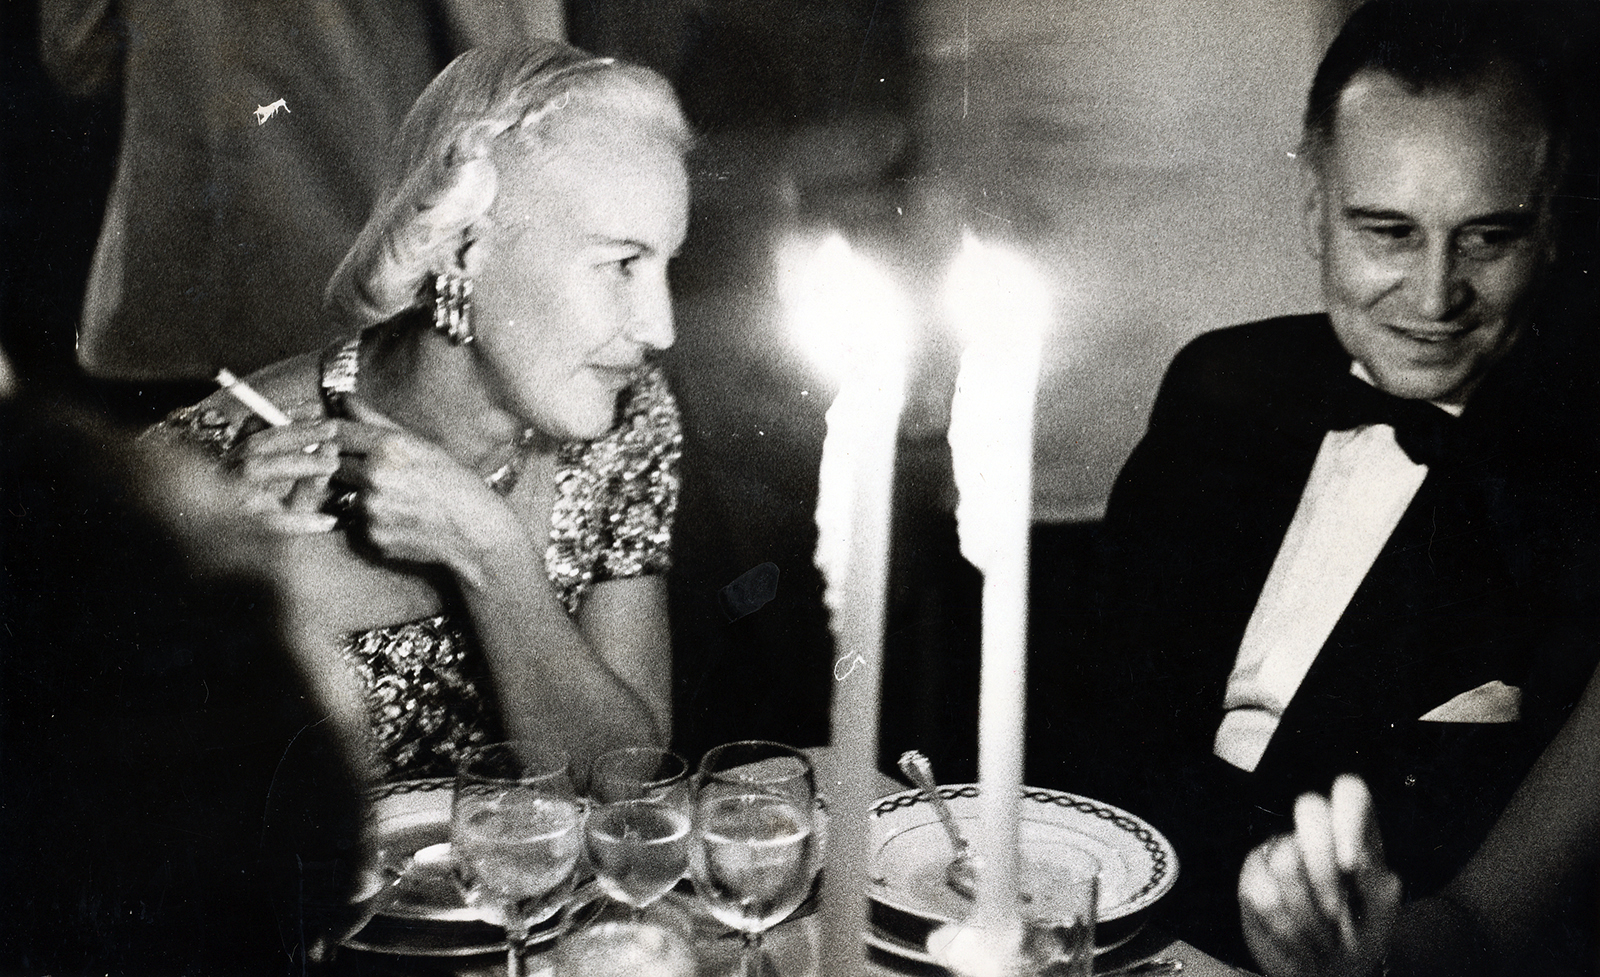 Alletta MacDonald (later McBean) and Robert Gardiner, c. 1960